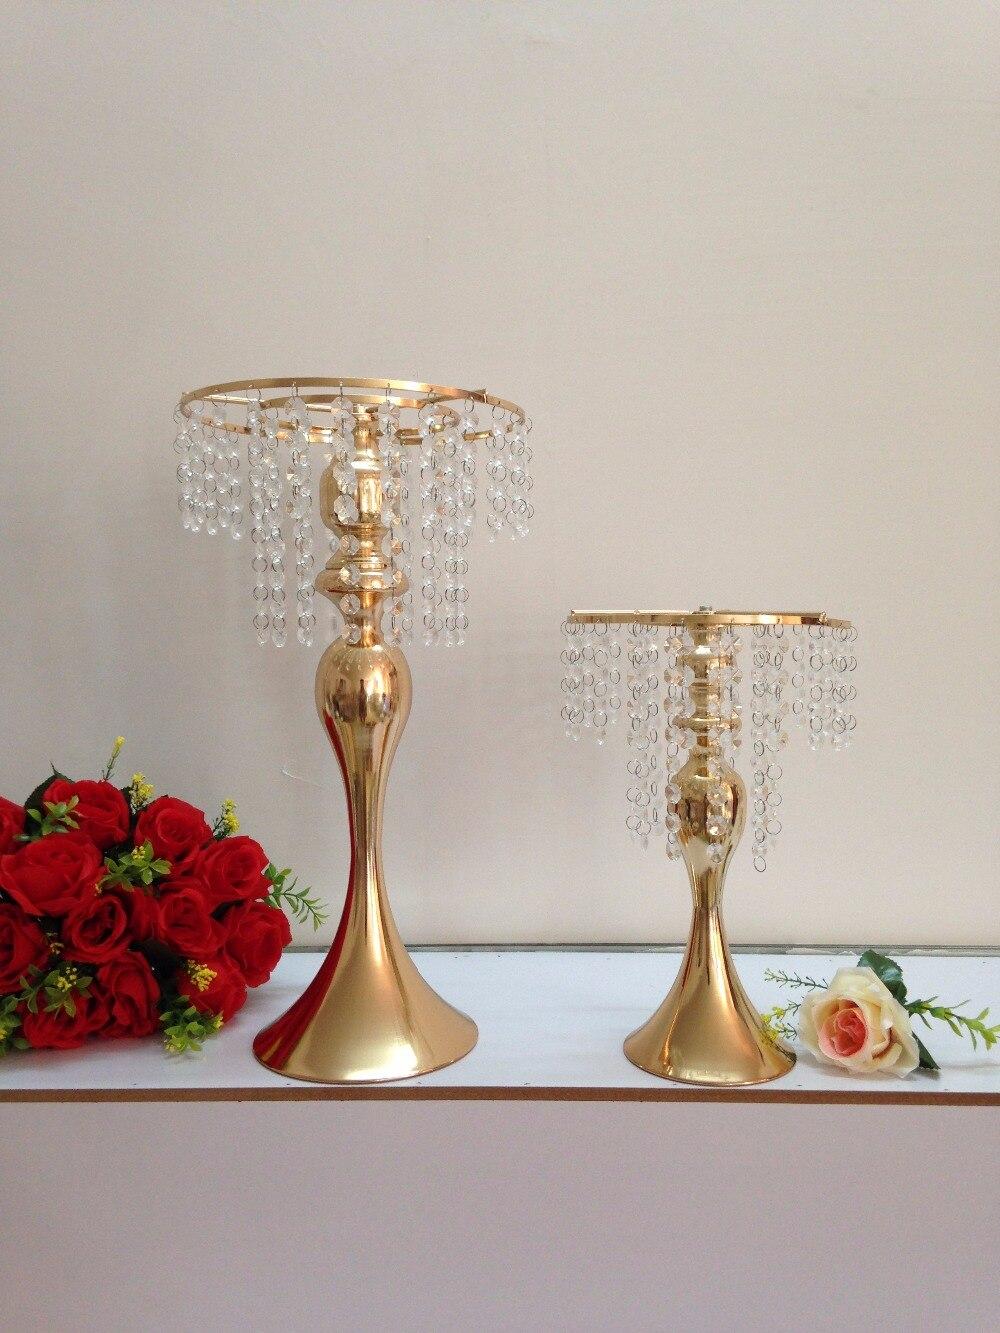 wedding vases Sweet 16 Candle Lighting Ideas garden themed centrepieces wedding centerpieces centerpiece